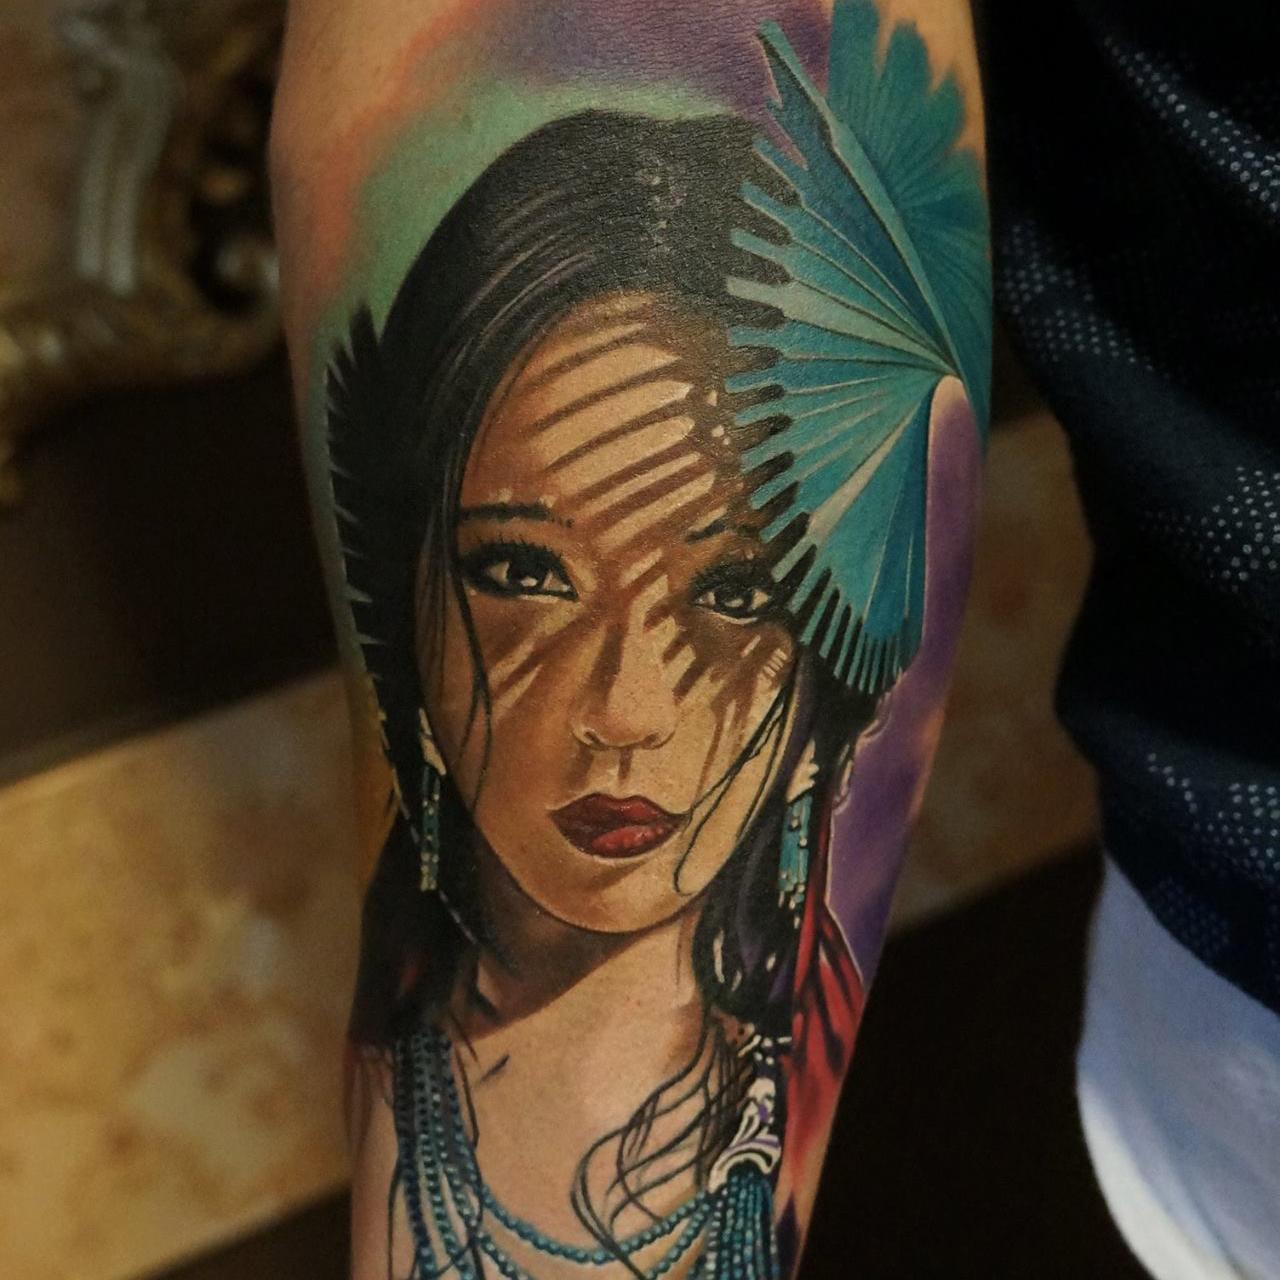 Eddy tattoo eddy tattoo art studio for Tattoo aftercare bepanthen